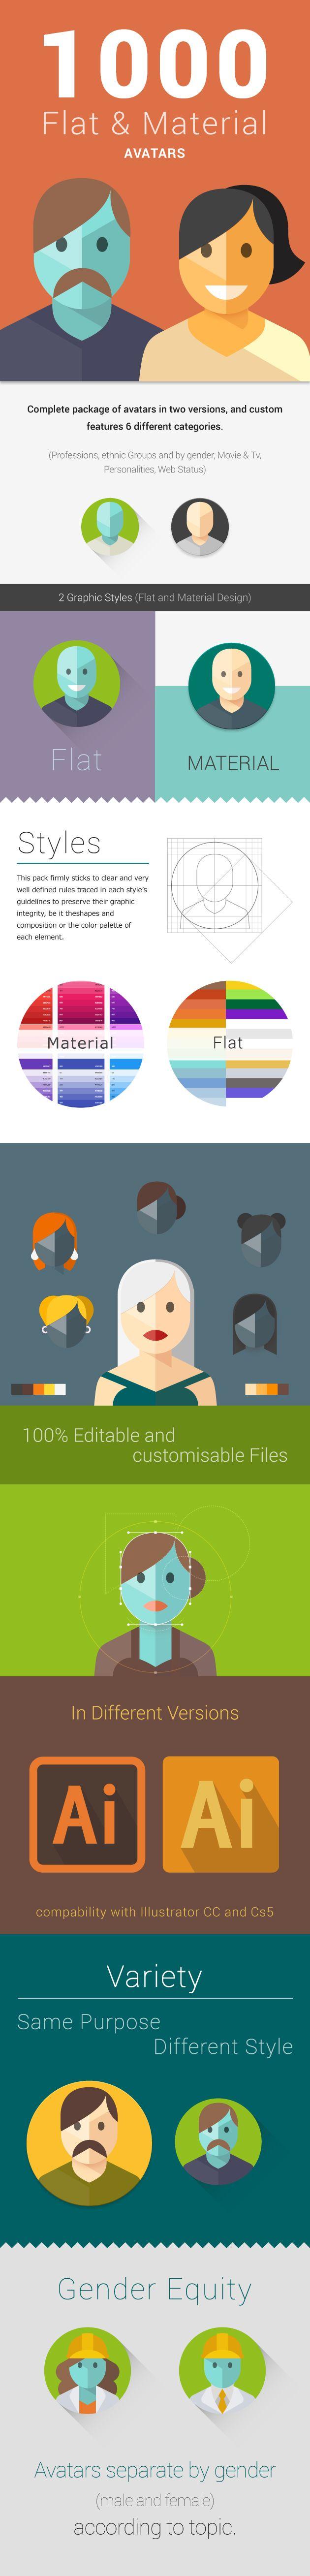 | web design inspiration | digital media arts college | www.dmac.edu | 561.391.1148